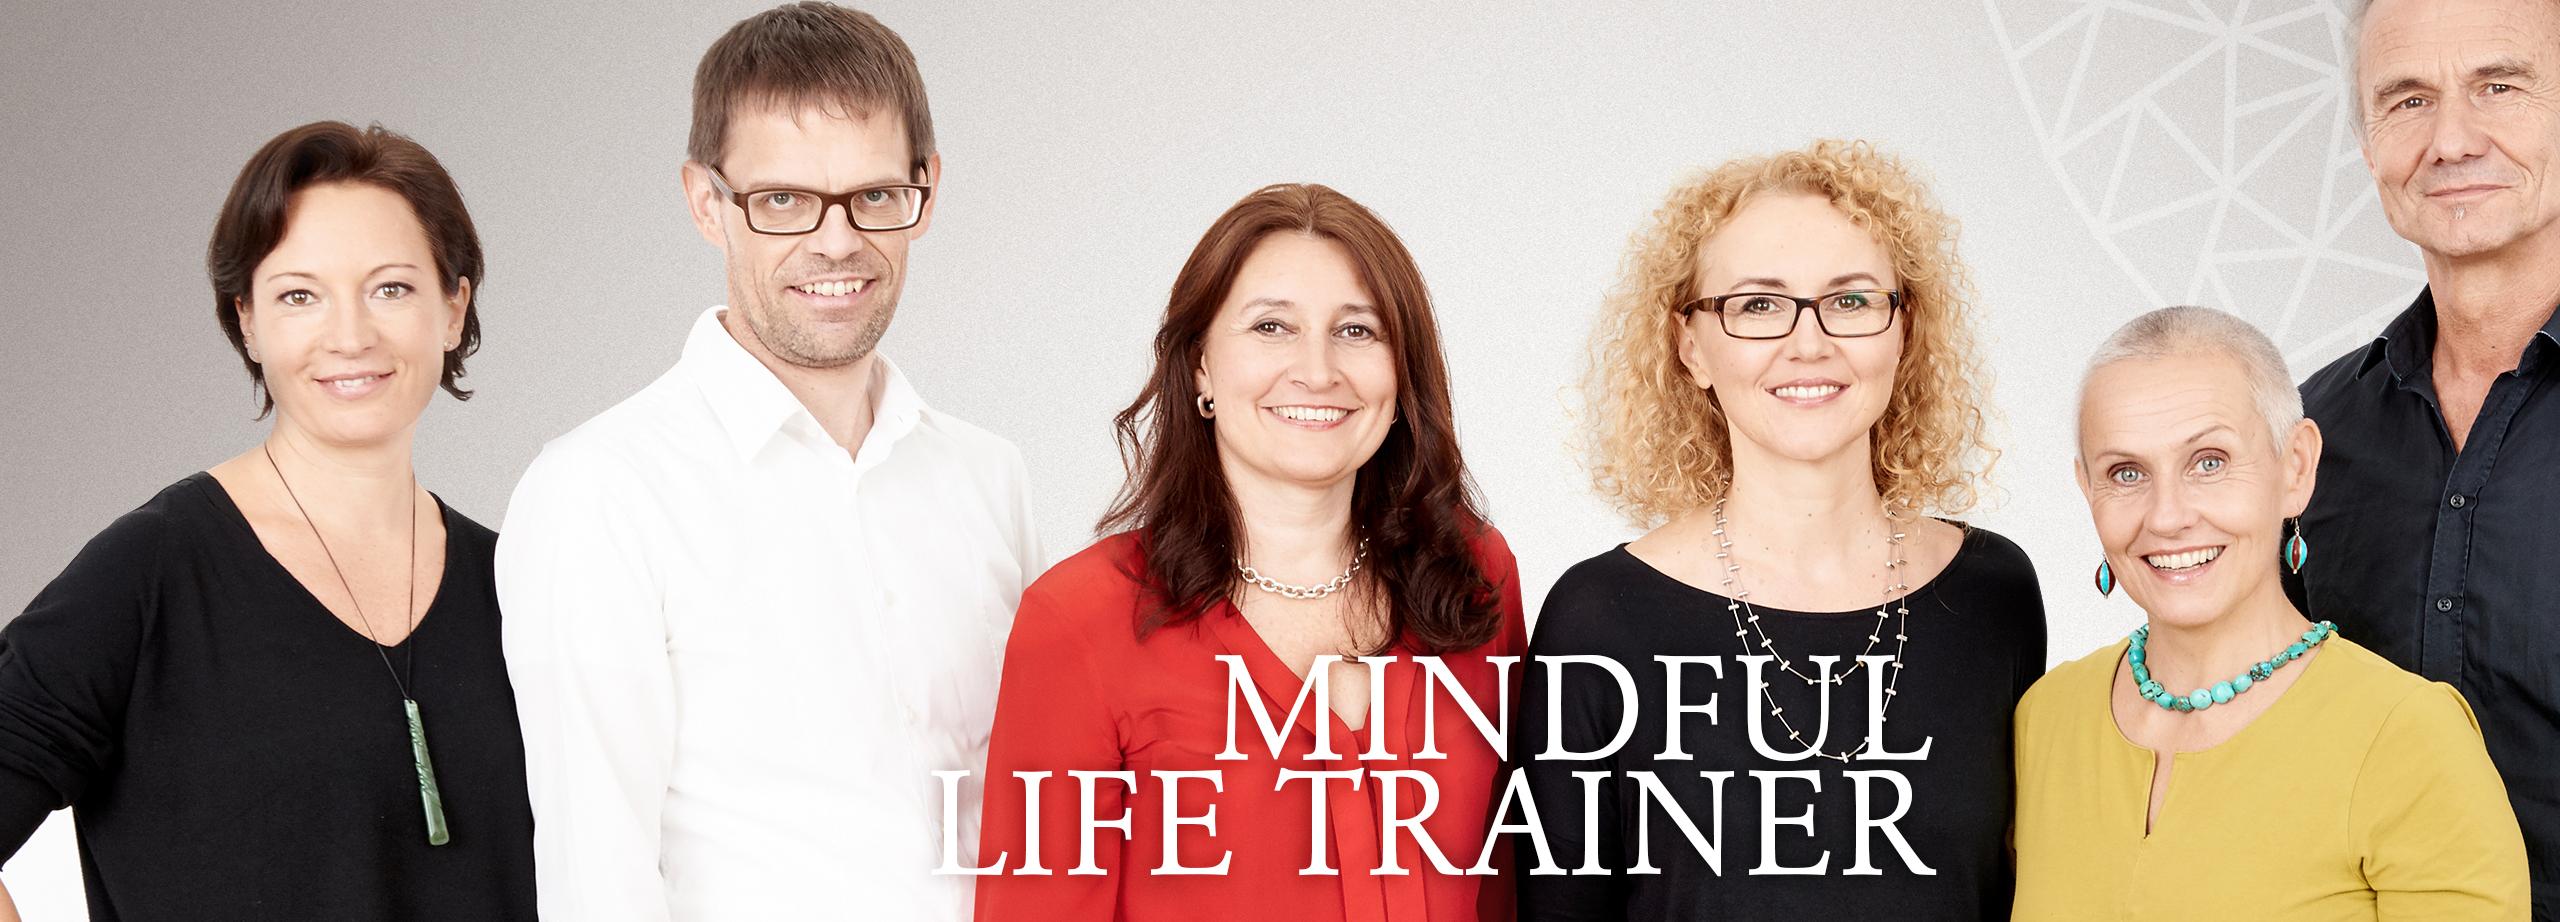 171031 achtsamkeits akademie website bild life trainer